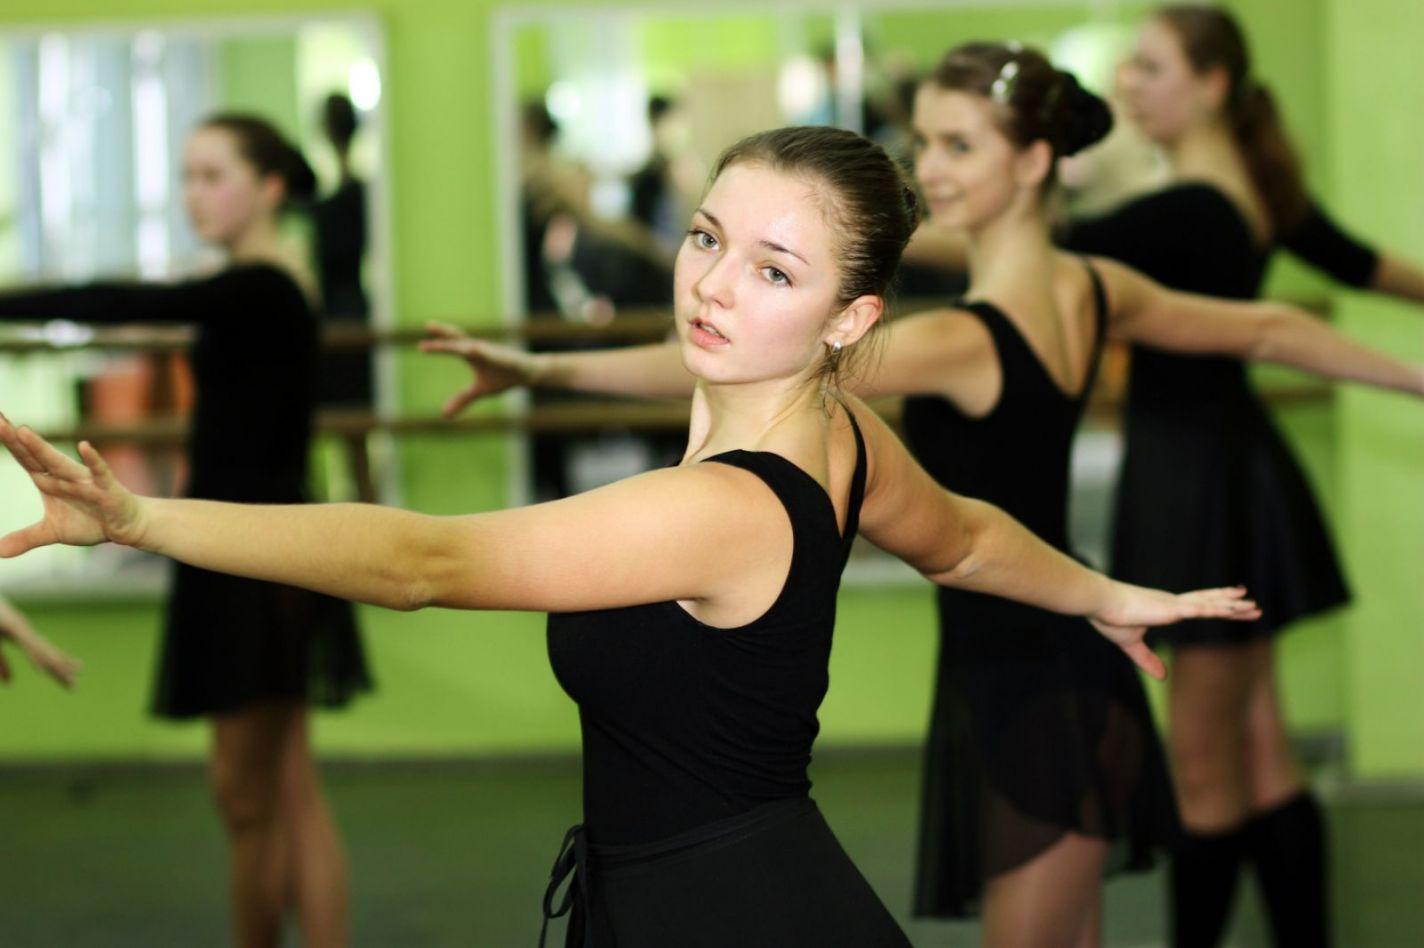 дети на занятиях танцами